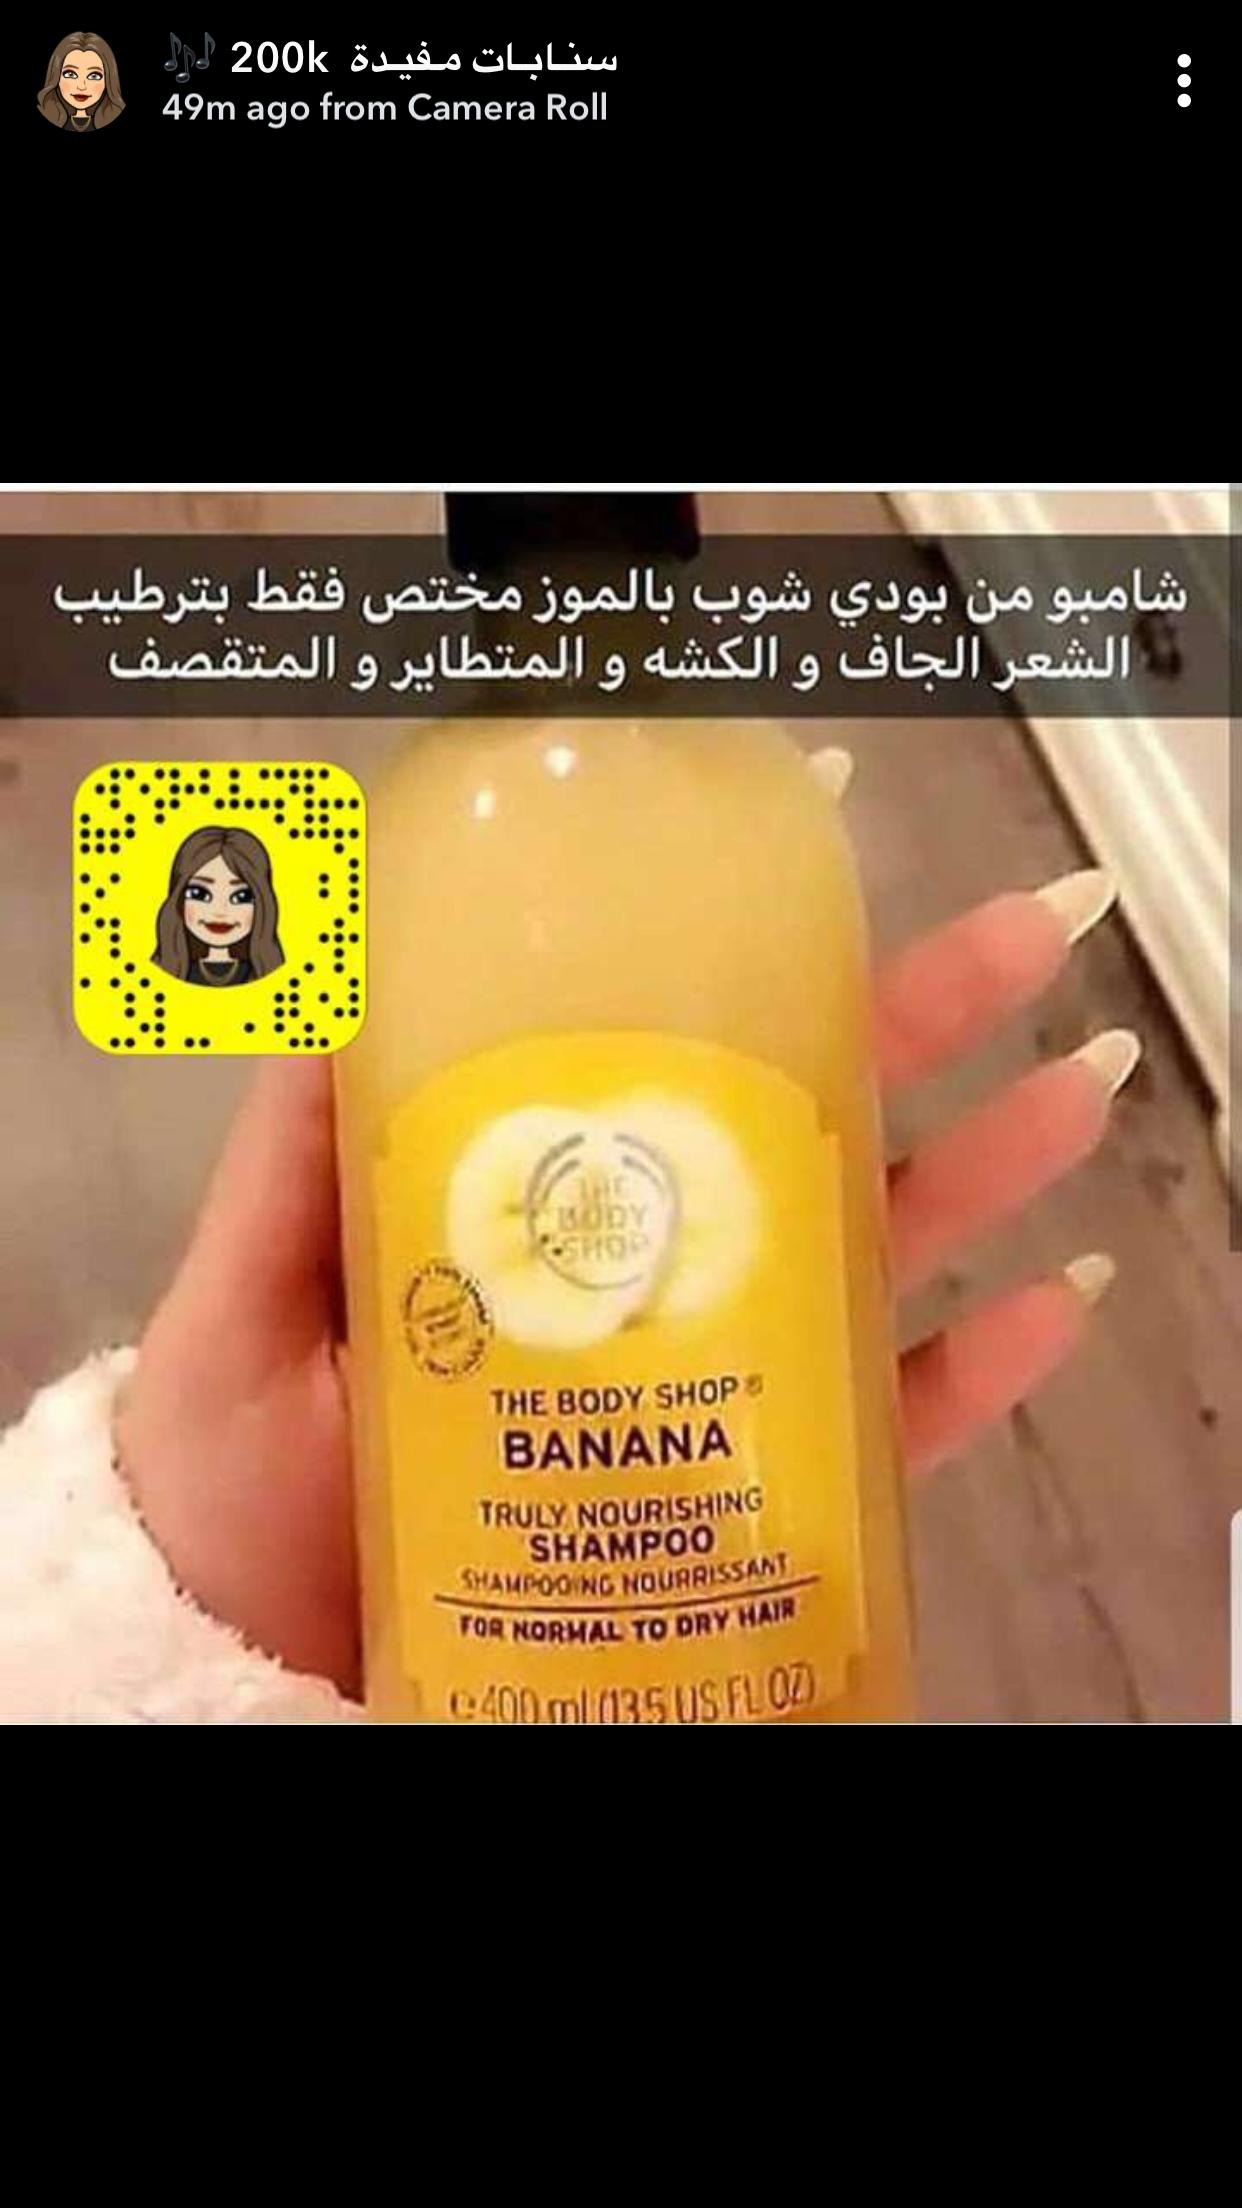 Pin By Maryam Alali On الجمال Nourishing Shampoo Beauty Skin Care Routine The Body Shop